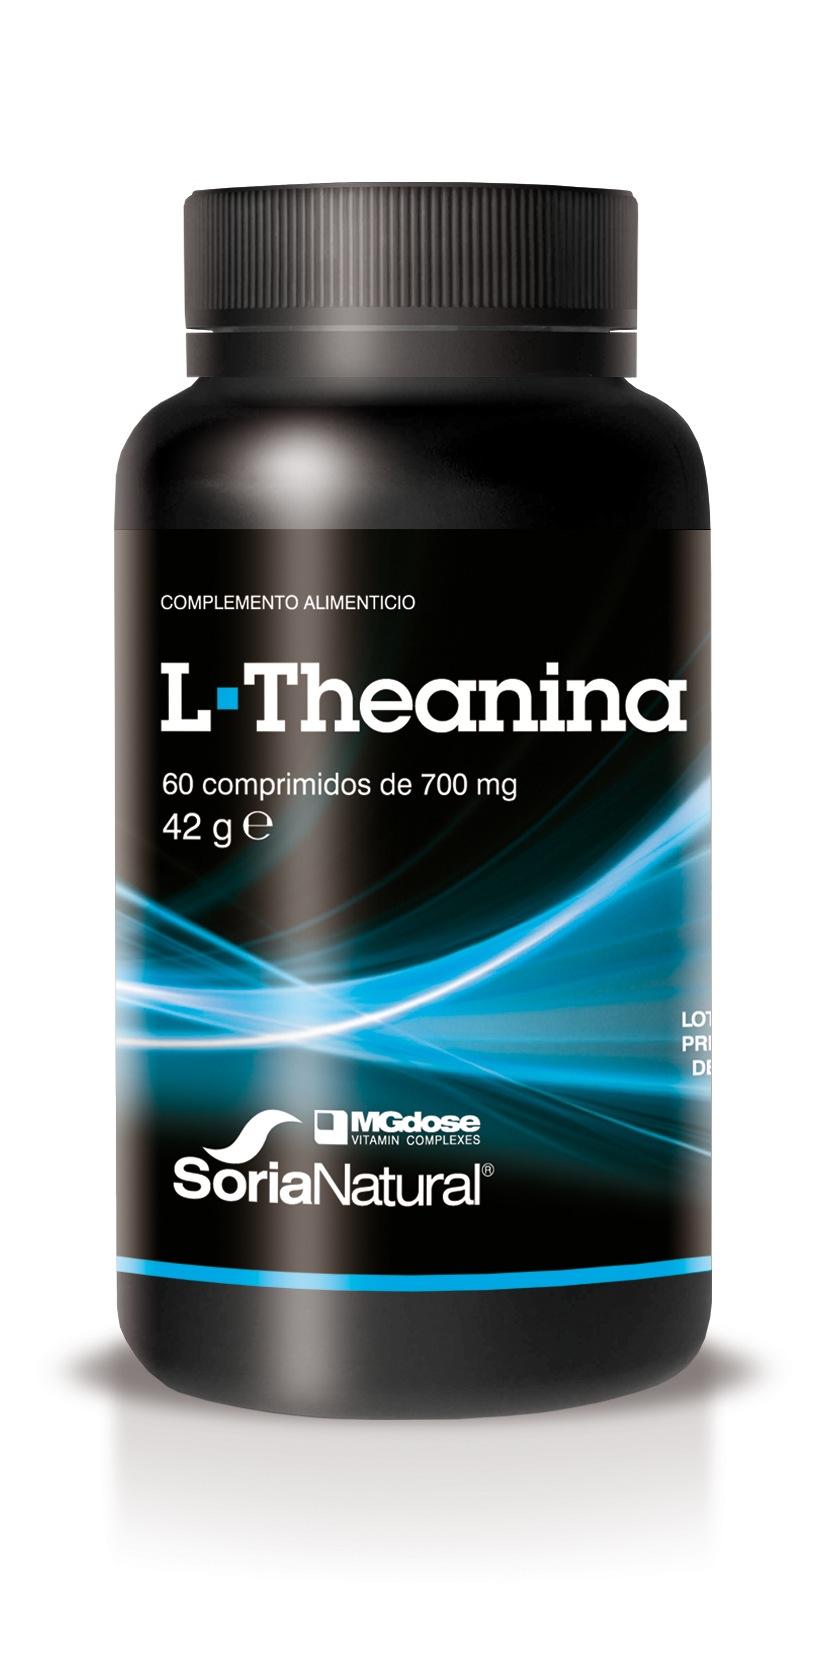 L-Theanina